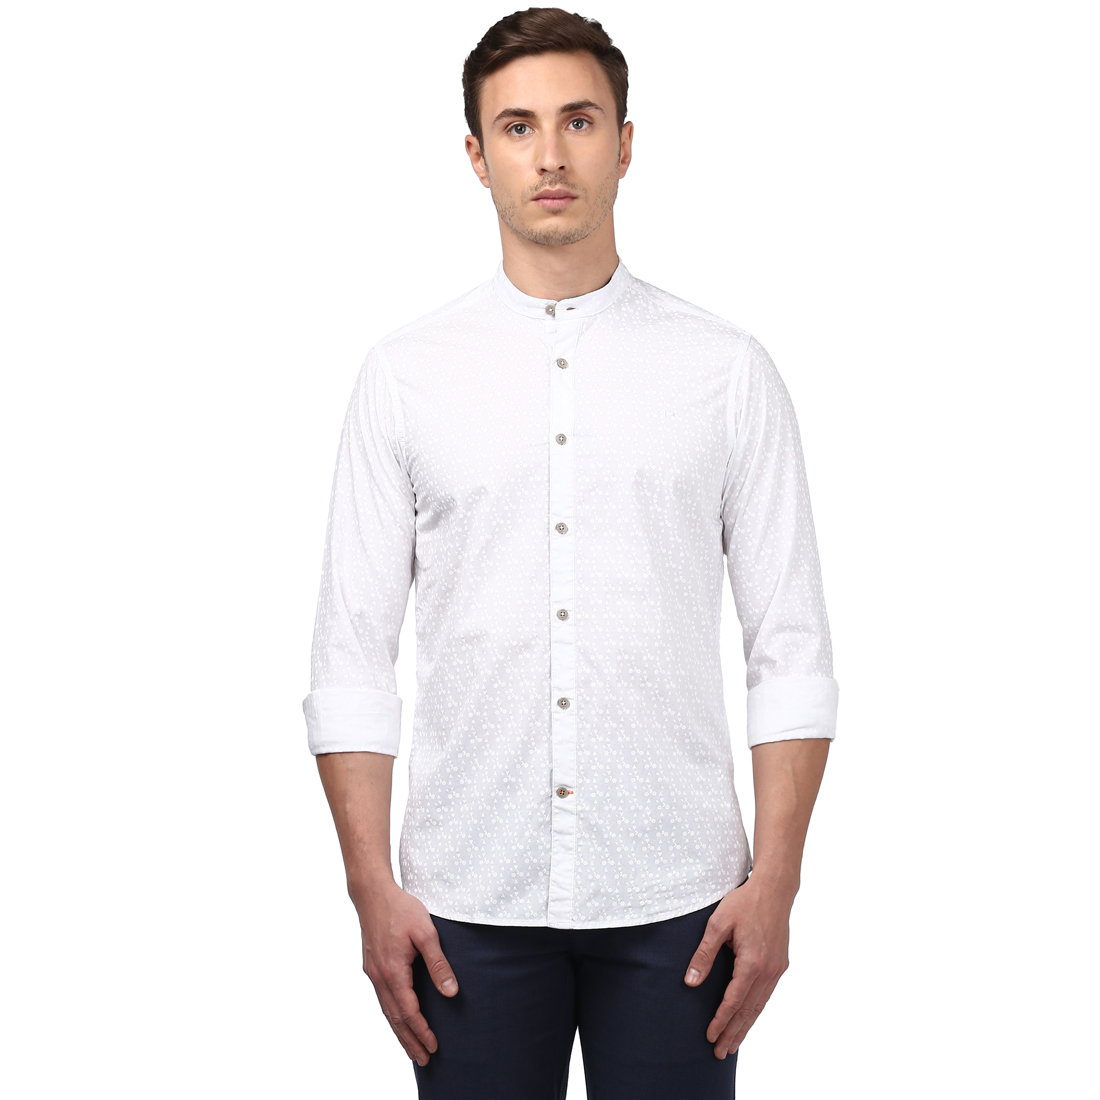 ColorPlus | ColorPlus White Regular Fit Shirts